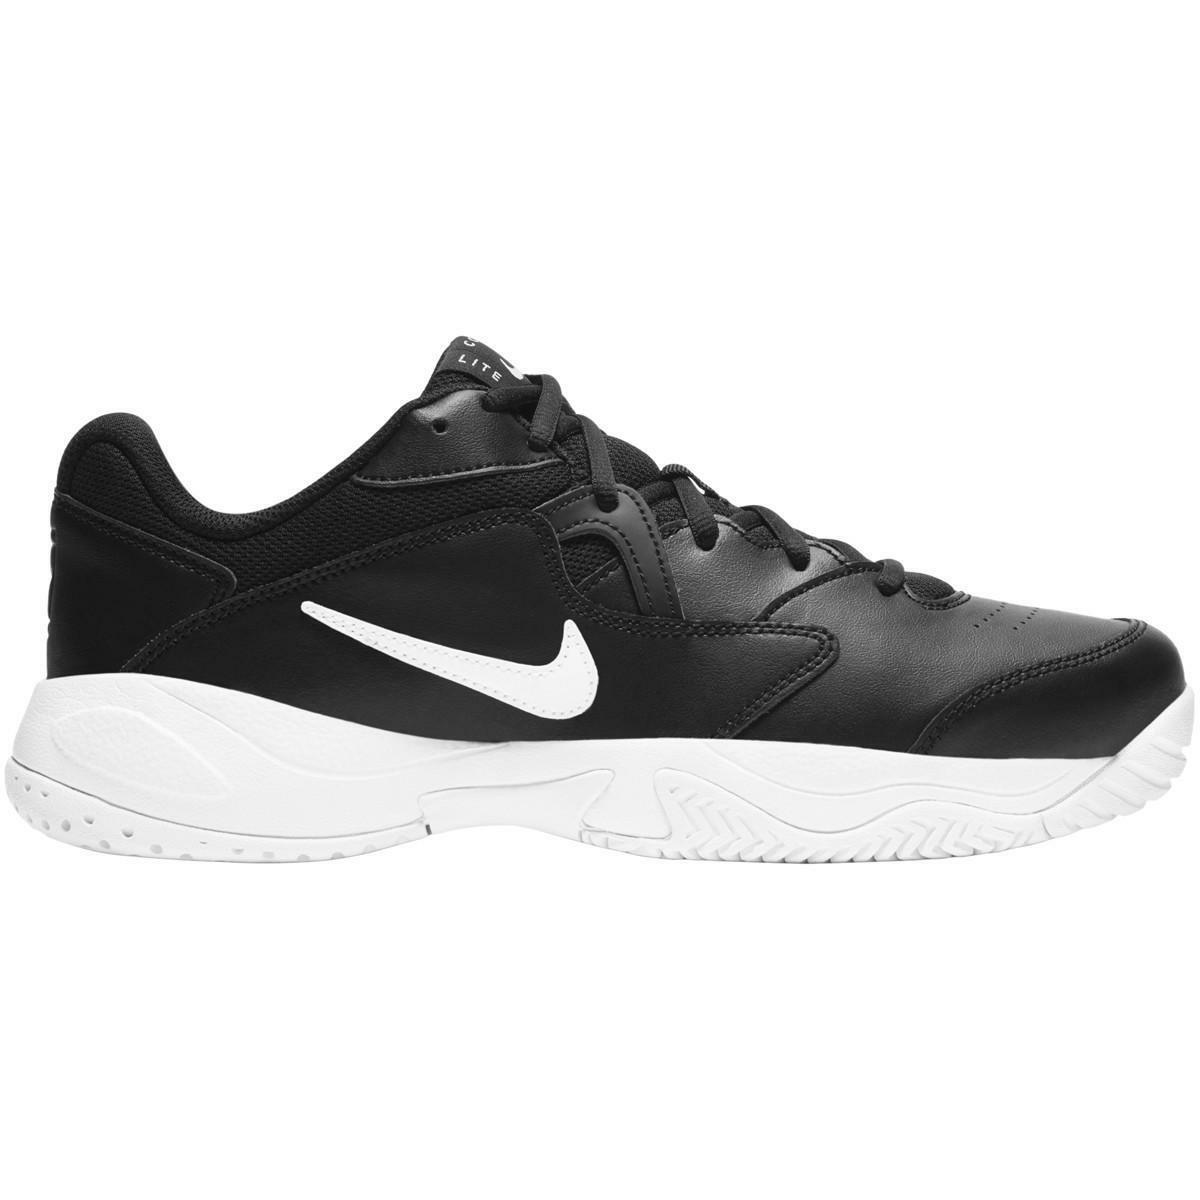 nike nike court lite 2 ar8836 005 scarpa sportiva tennis uomo nero